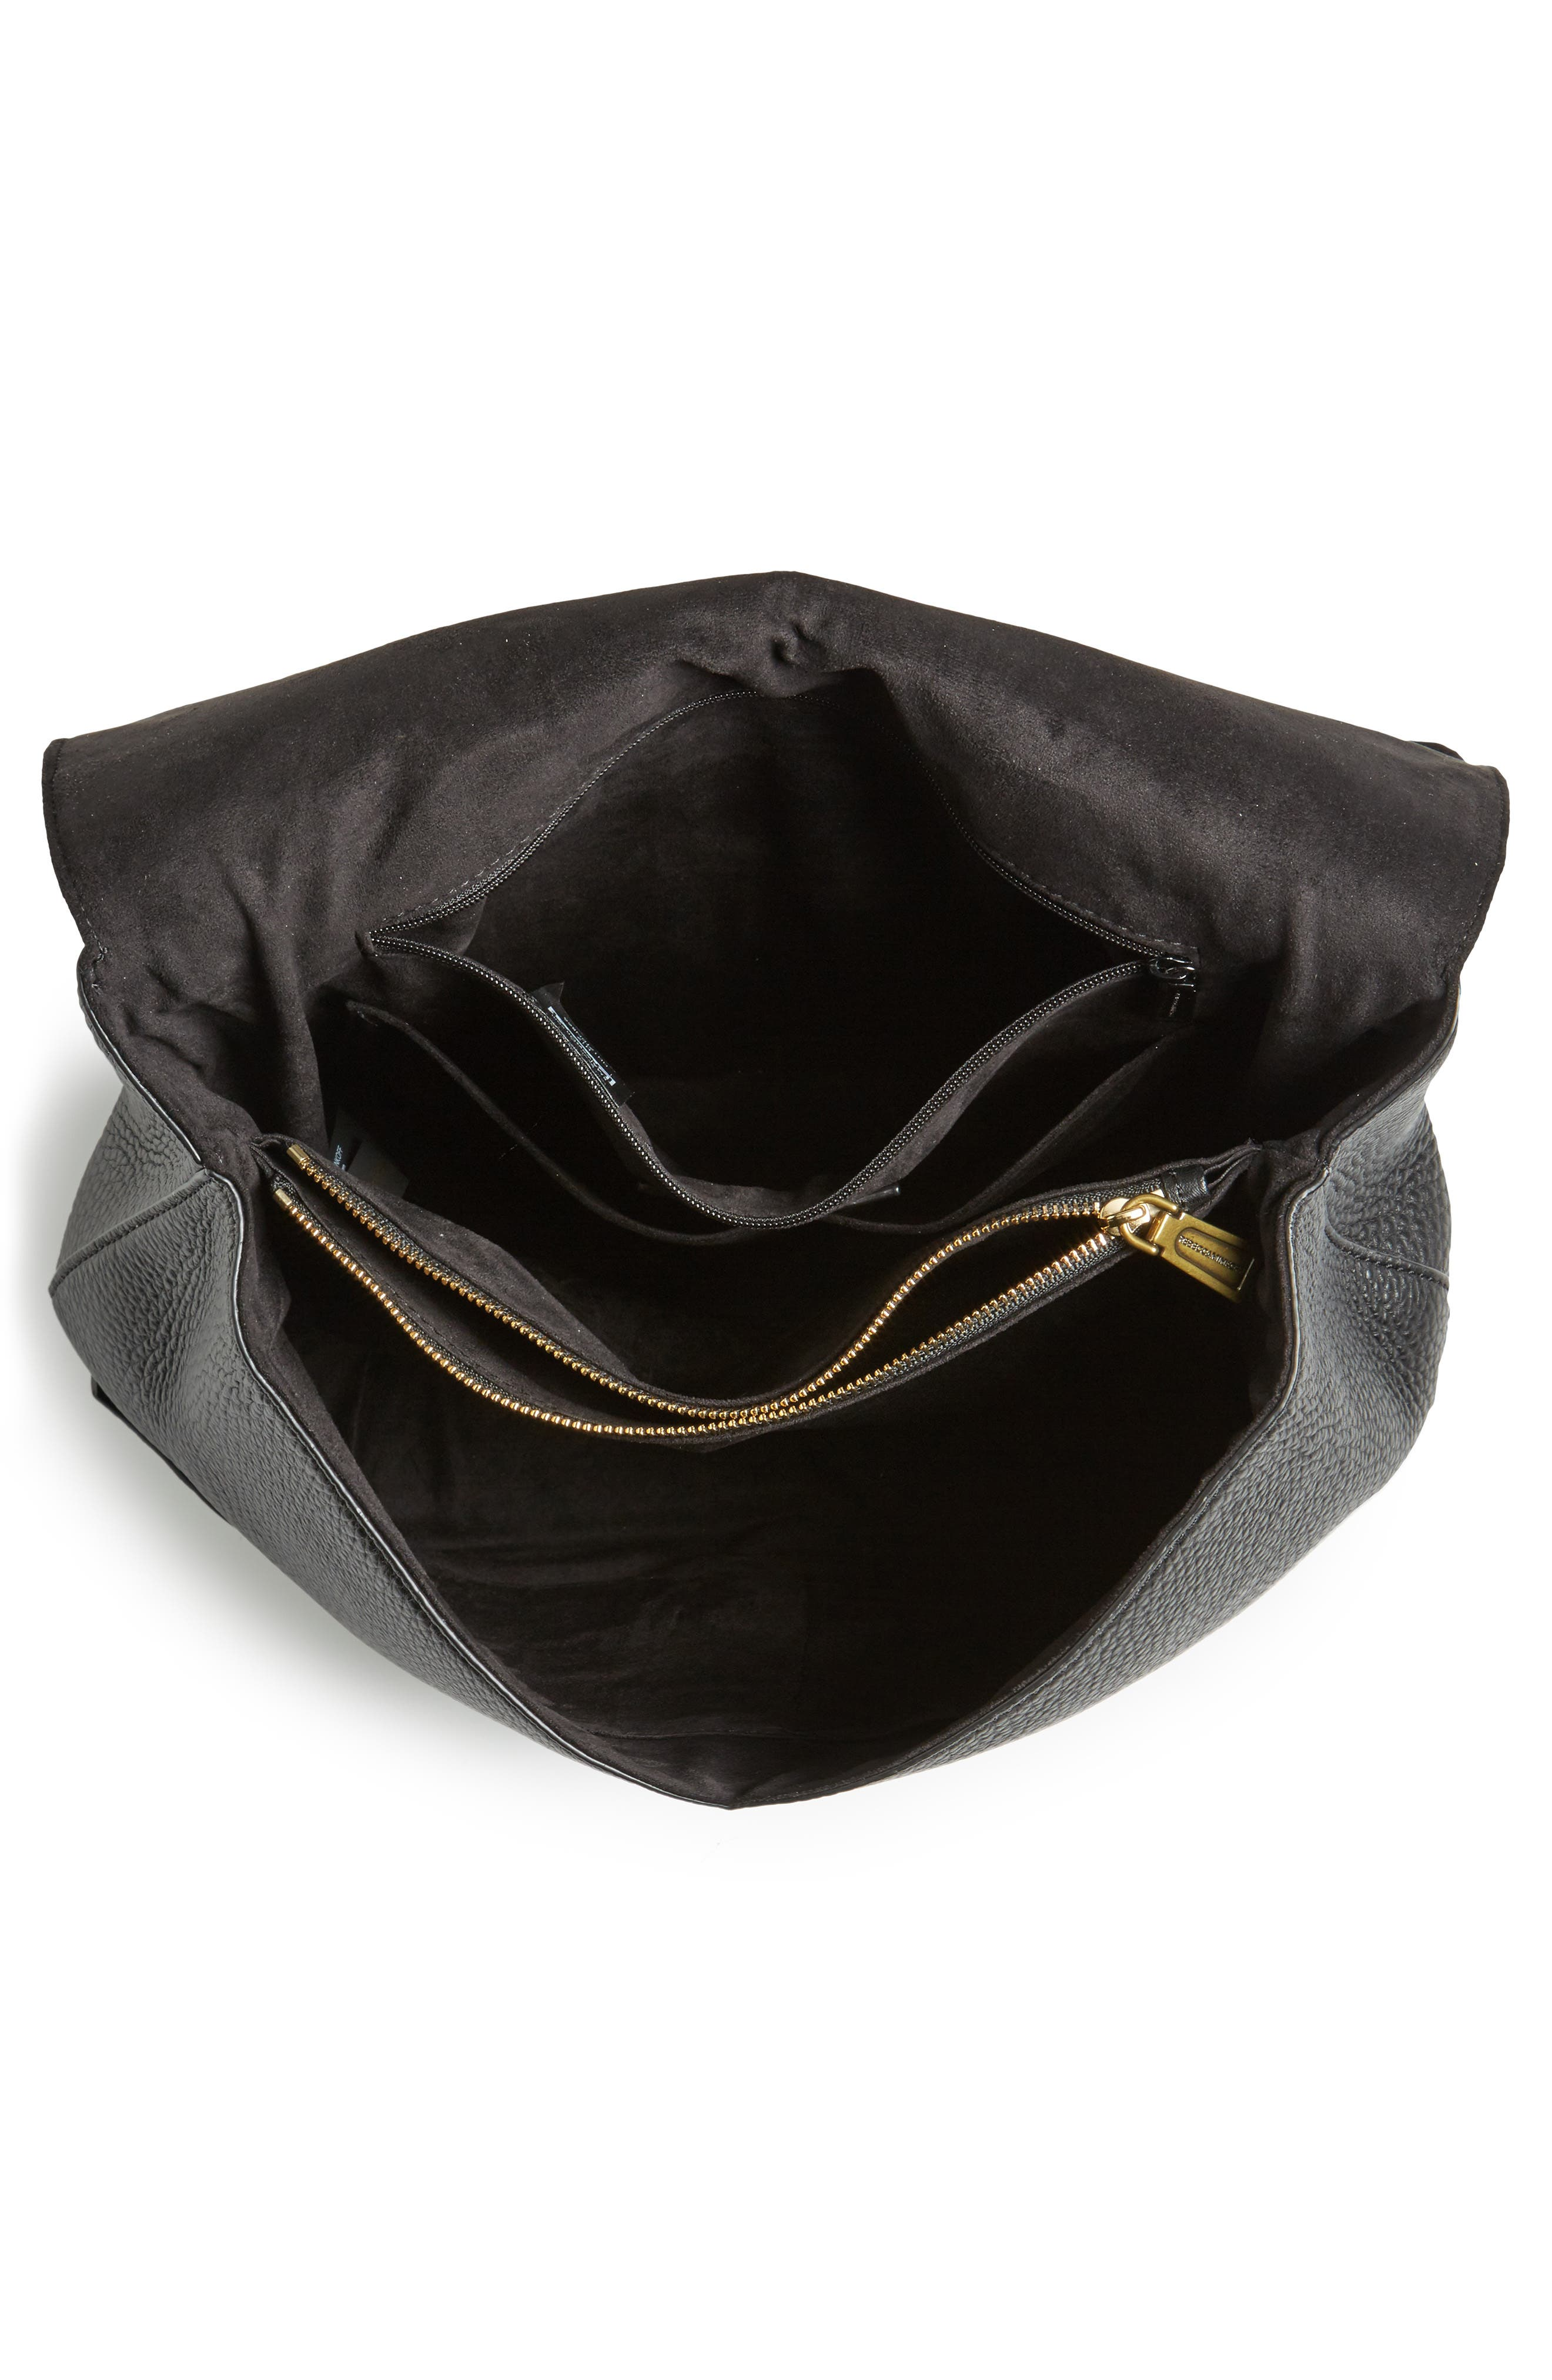 Darren Convertible Leather Backpack,                             Alternate thumbnail 5, color,                             Black